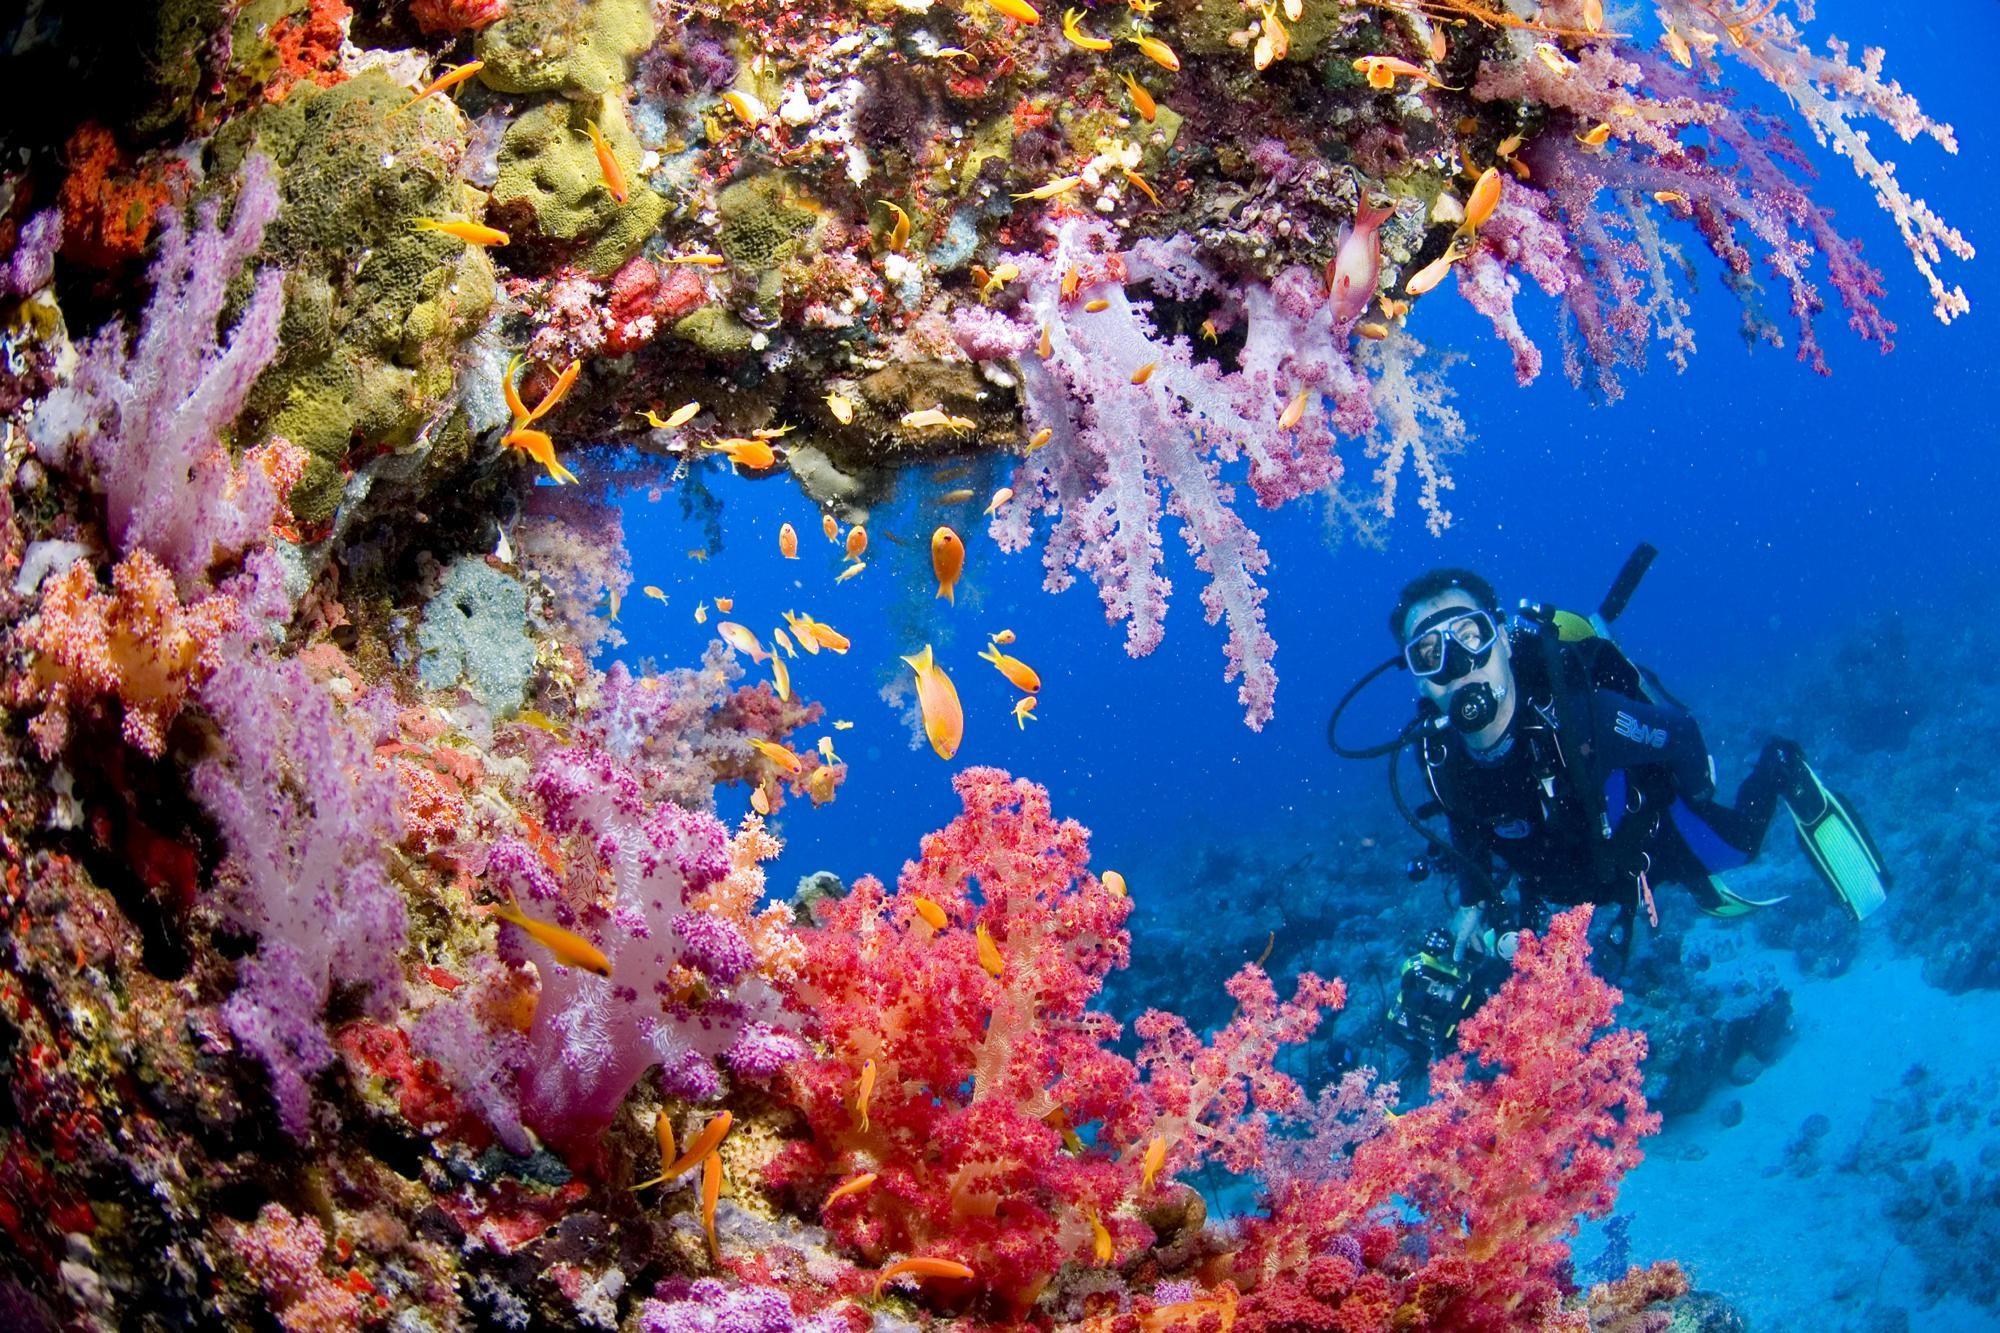 Sports Scuba Diving Ocean Sea Underwater Coral Reef People Background Free